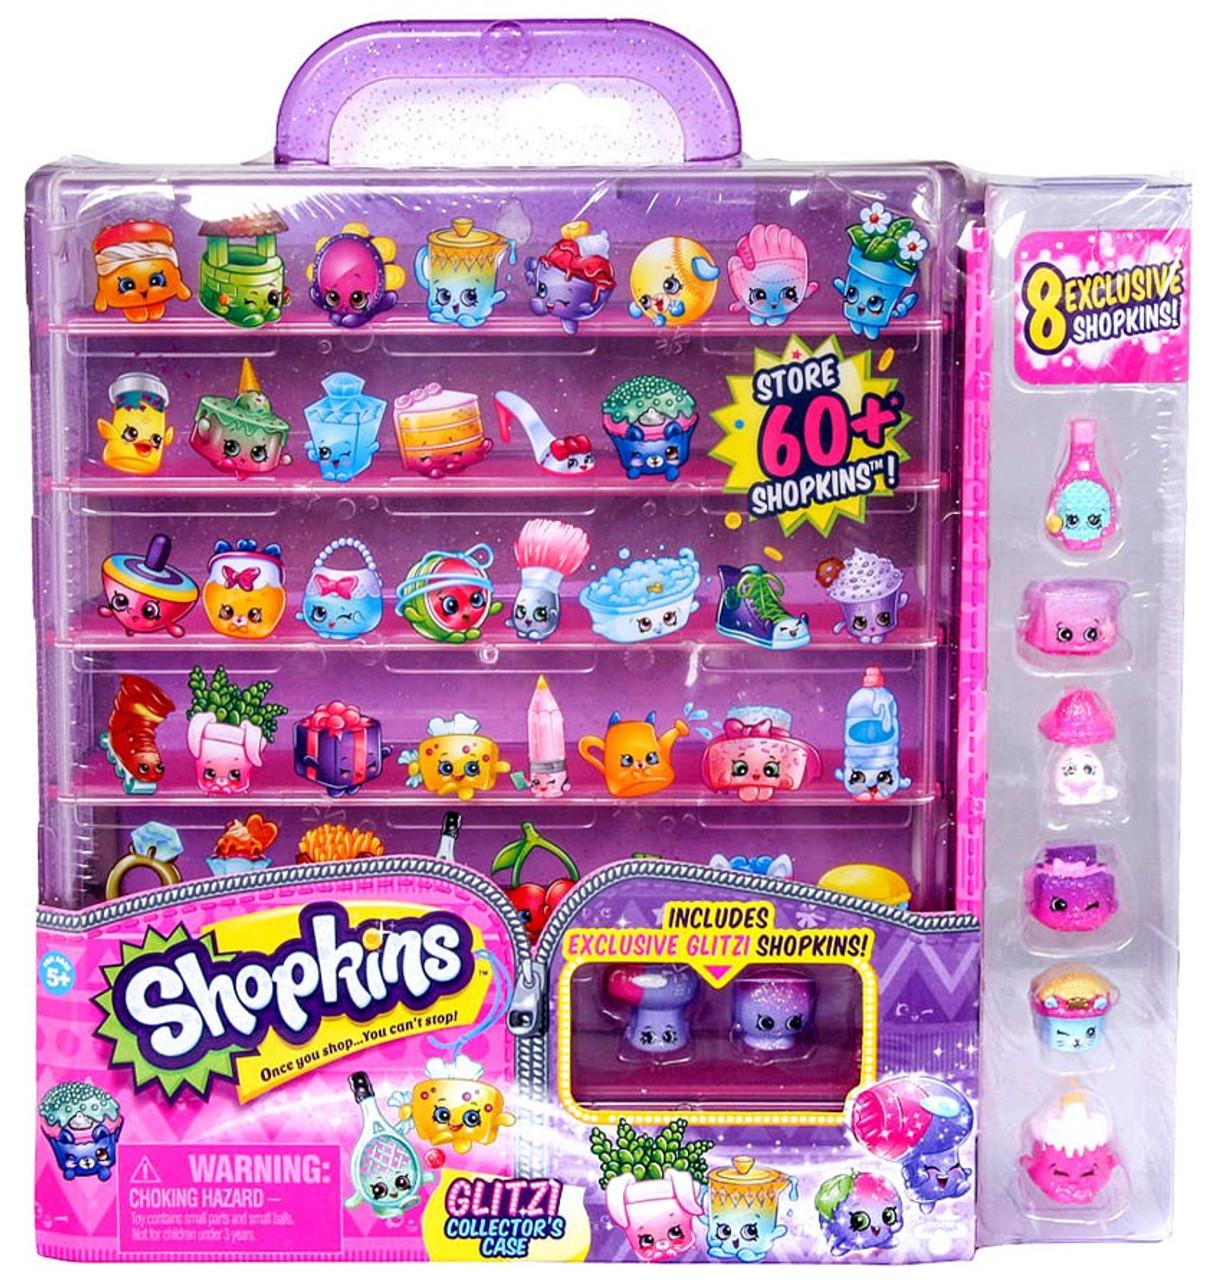 Shopkins Season 5 Glitzi Collector Case Moose Toys - ToyWiz